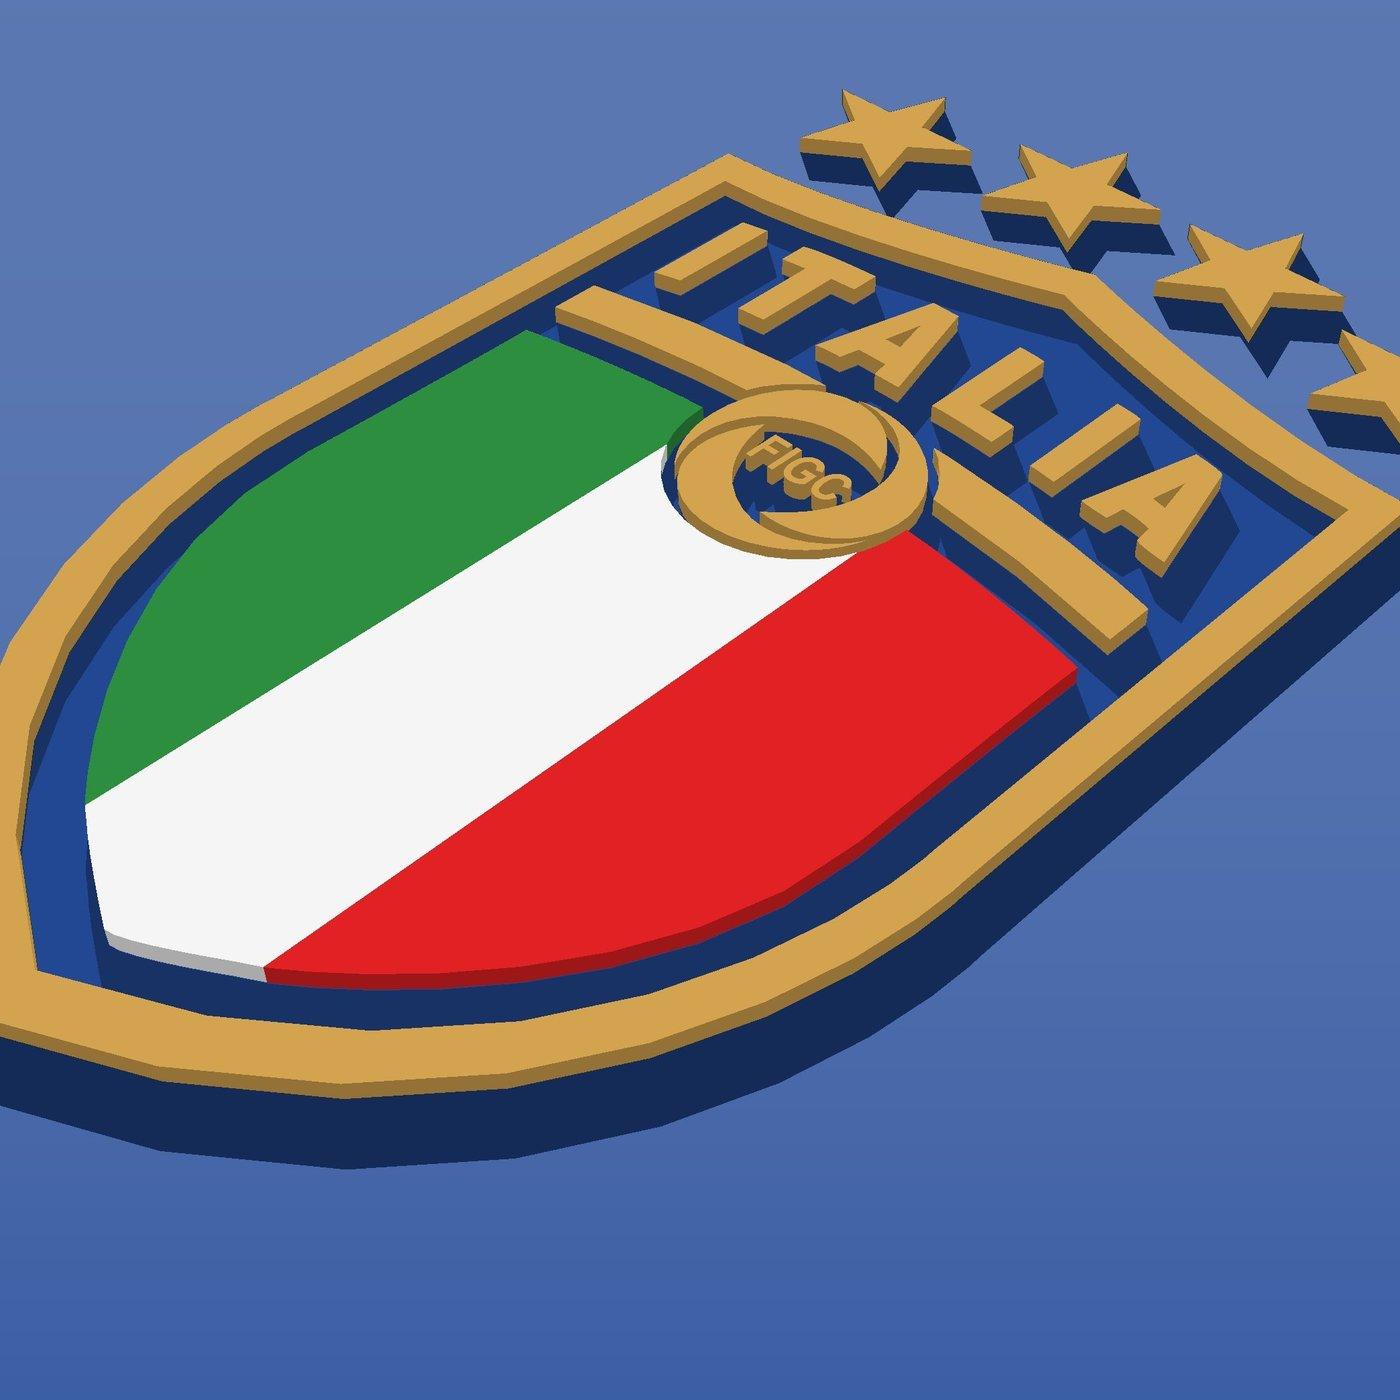 Forza Azzurri for Italian soccer team